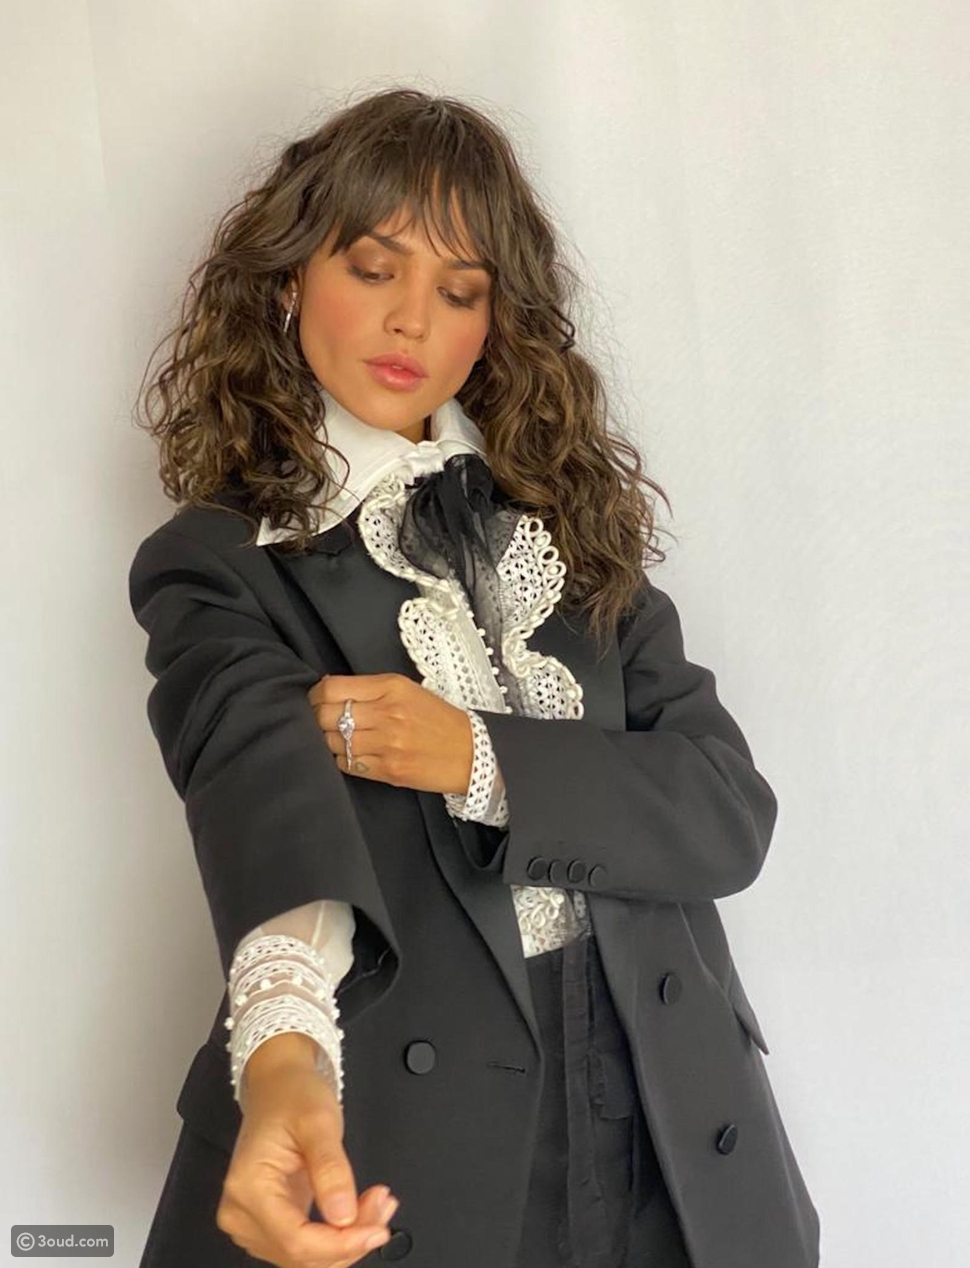 إيزا جونزاليس ترتدي مجوهرات من MESSIKA